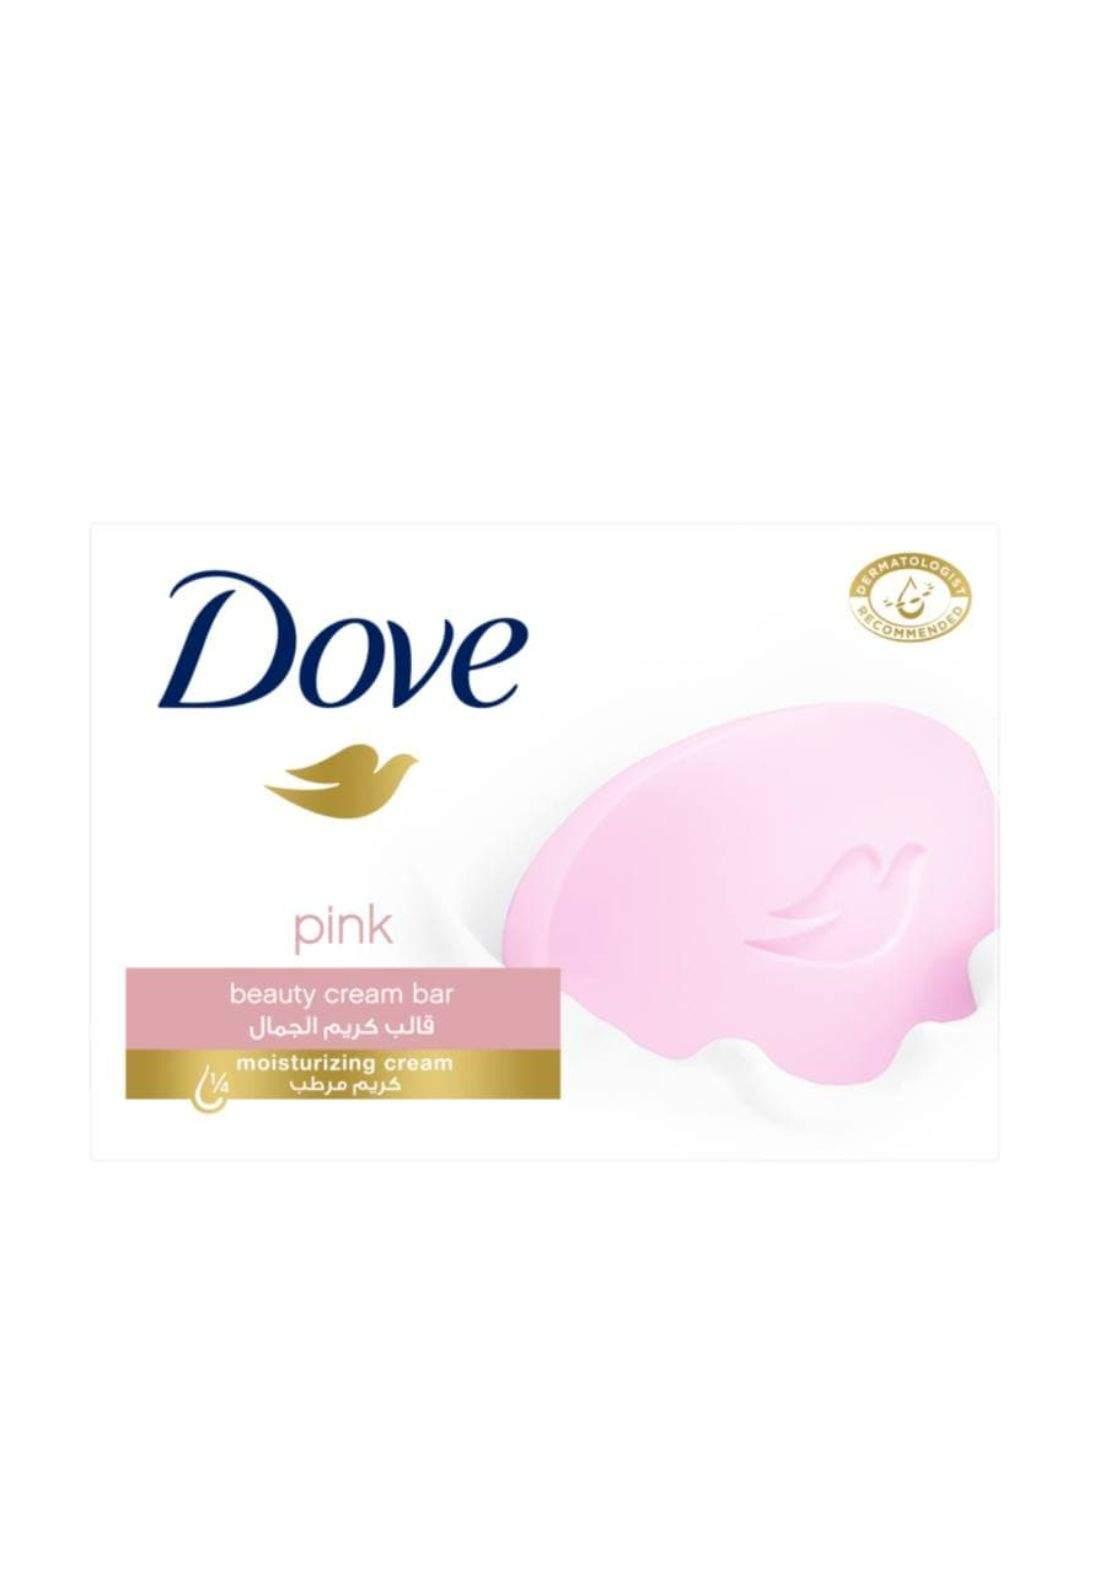 Dove beauty cream bar 100g صابونة دوف